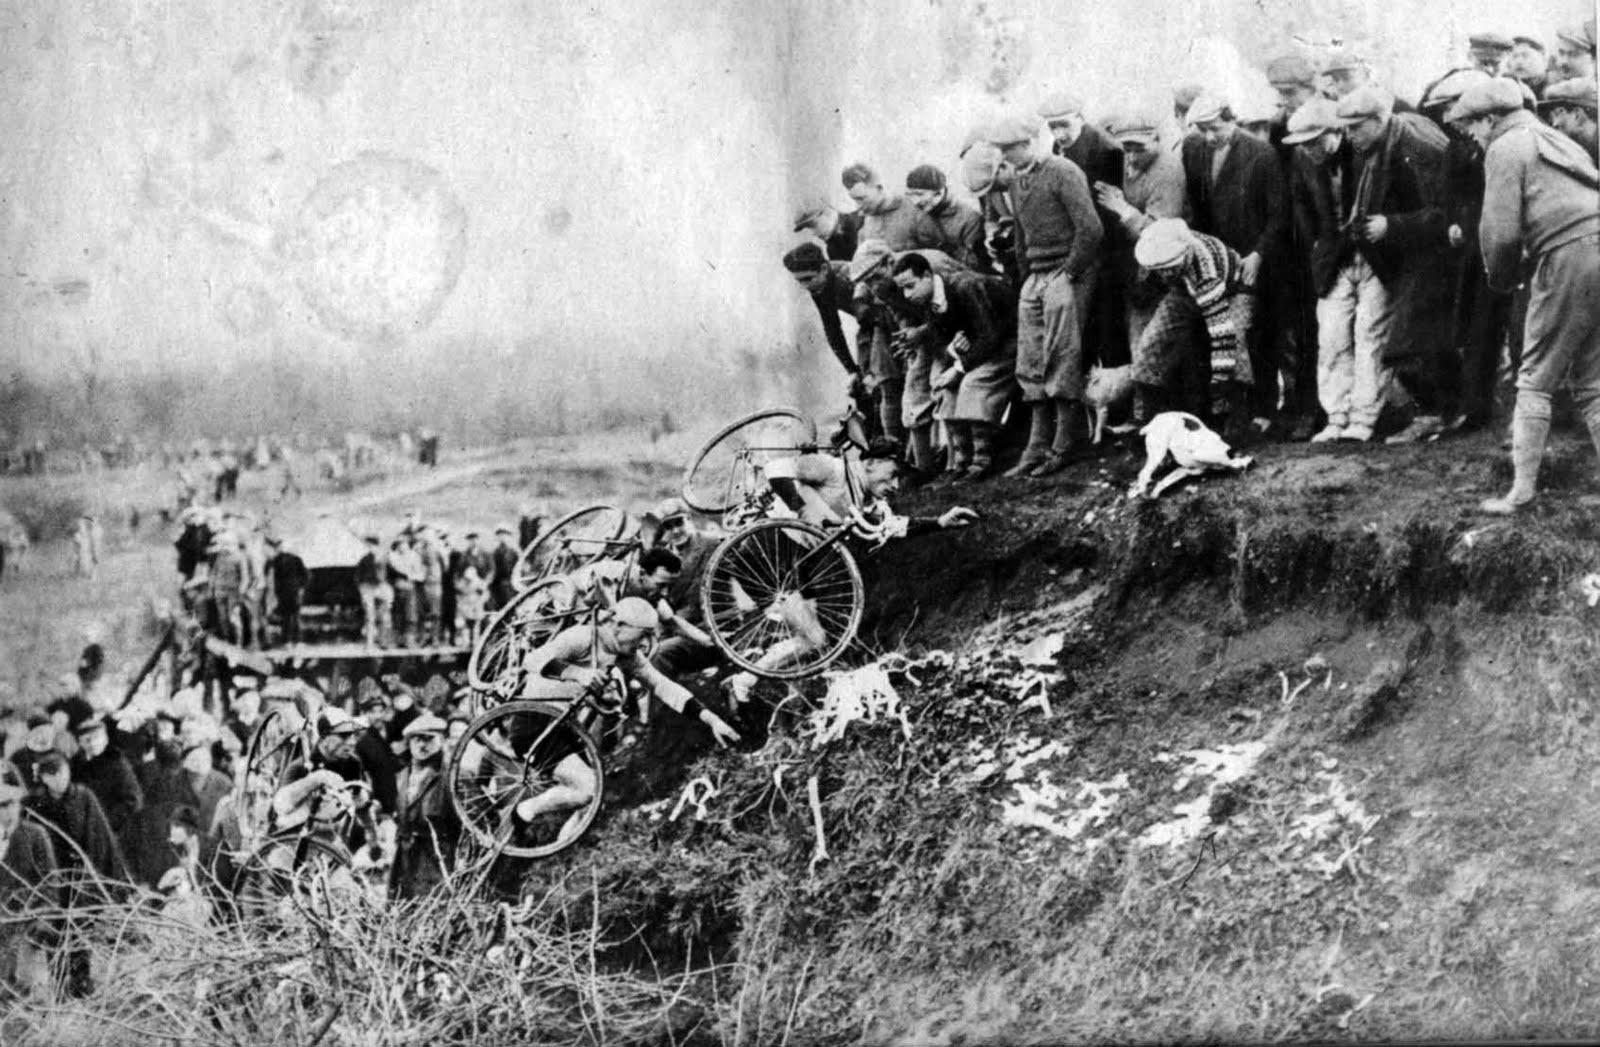 wielrennen in 1931